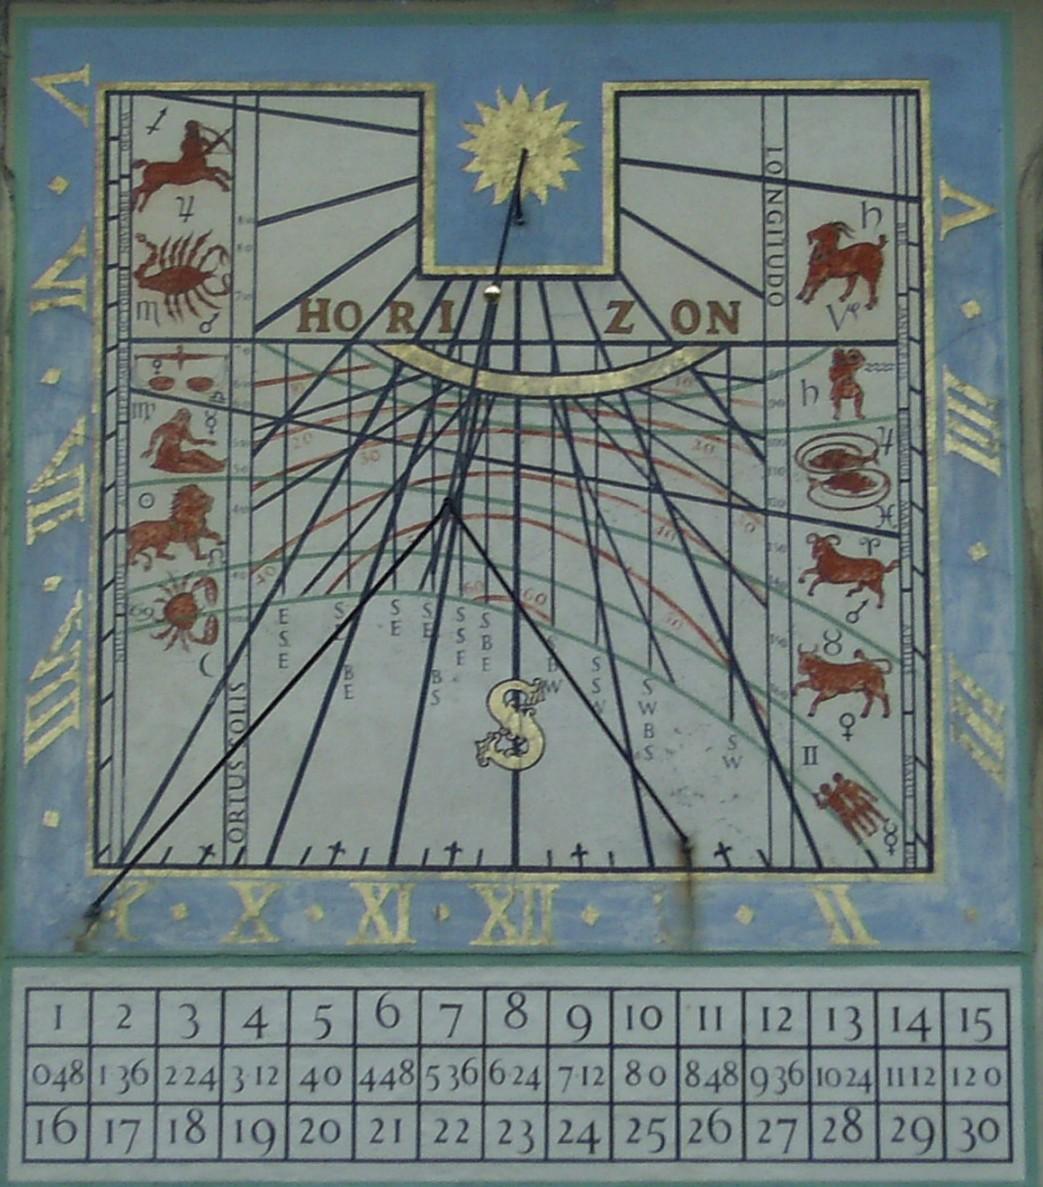 Moondial - Wikipedia